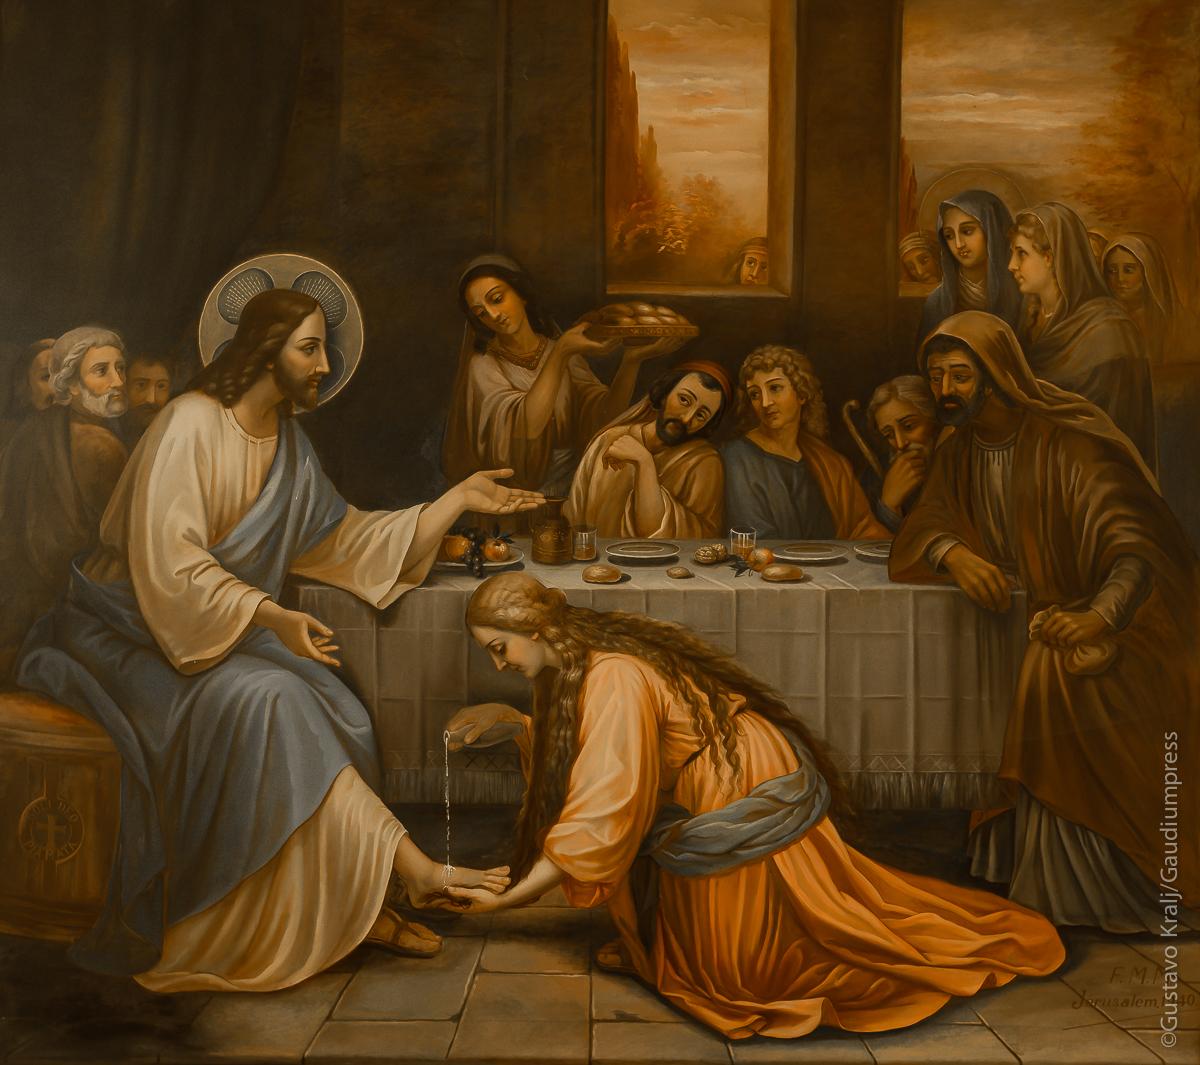 Jesus con los fariseos. Betania, Jesusalem. Foto: Gustavo Kralj/GaudiumpressImages